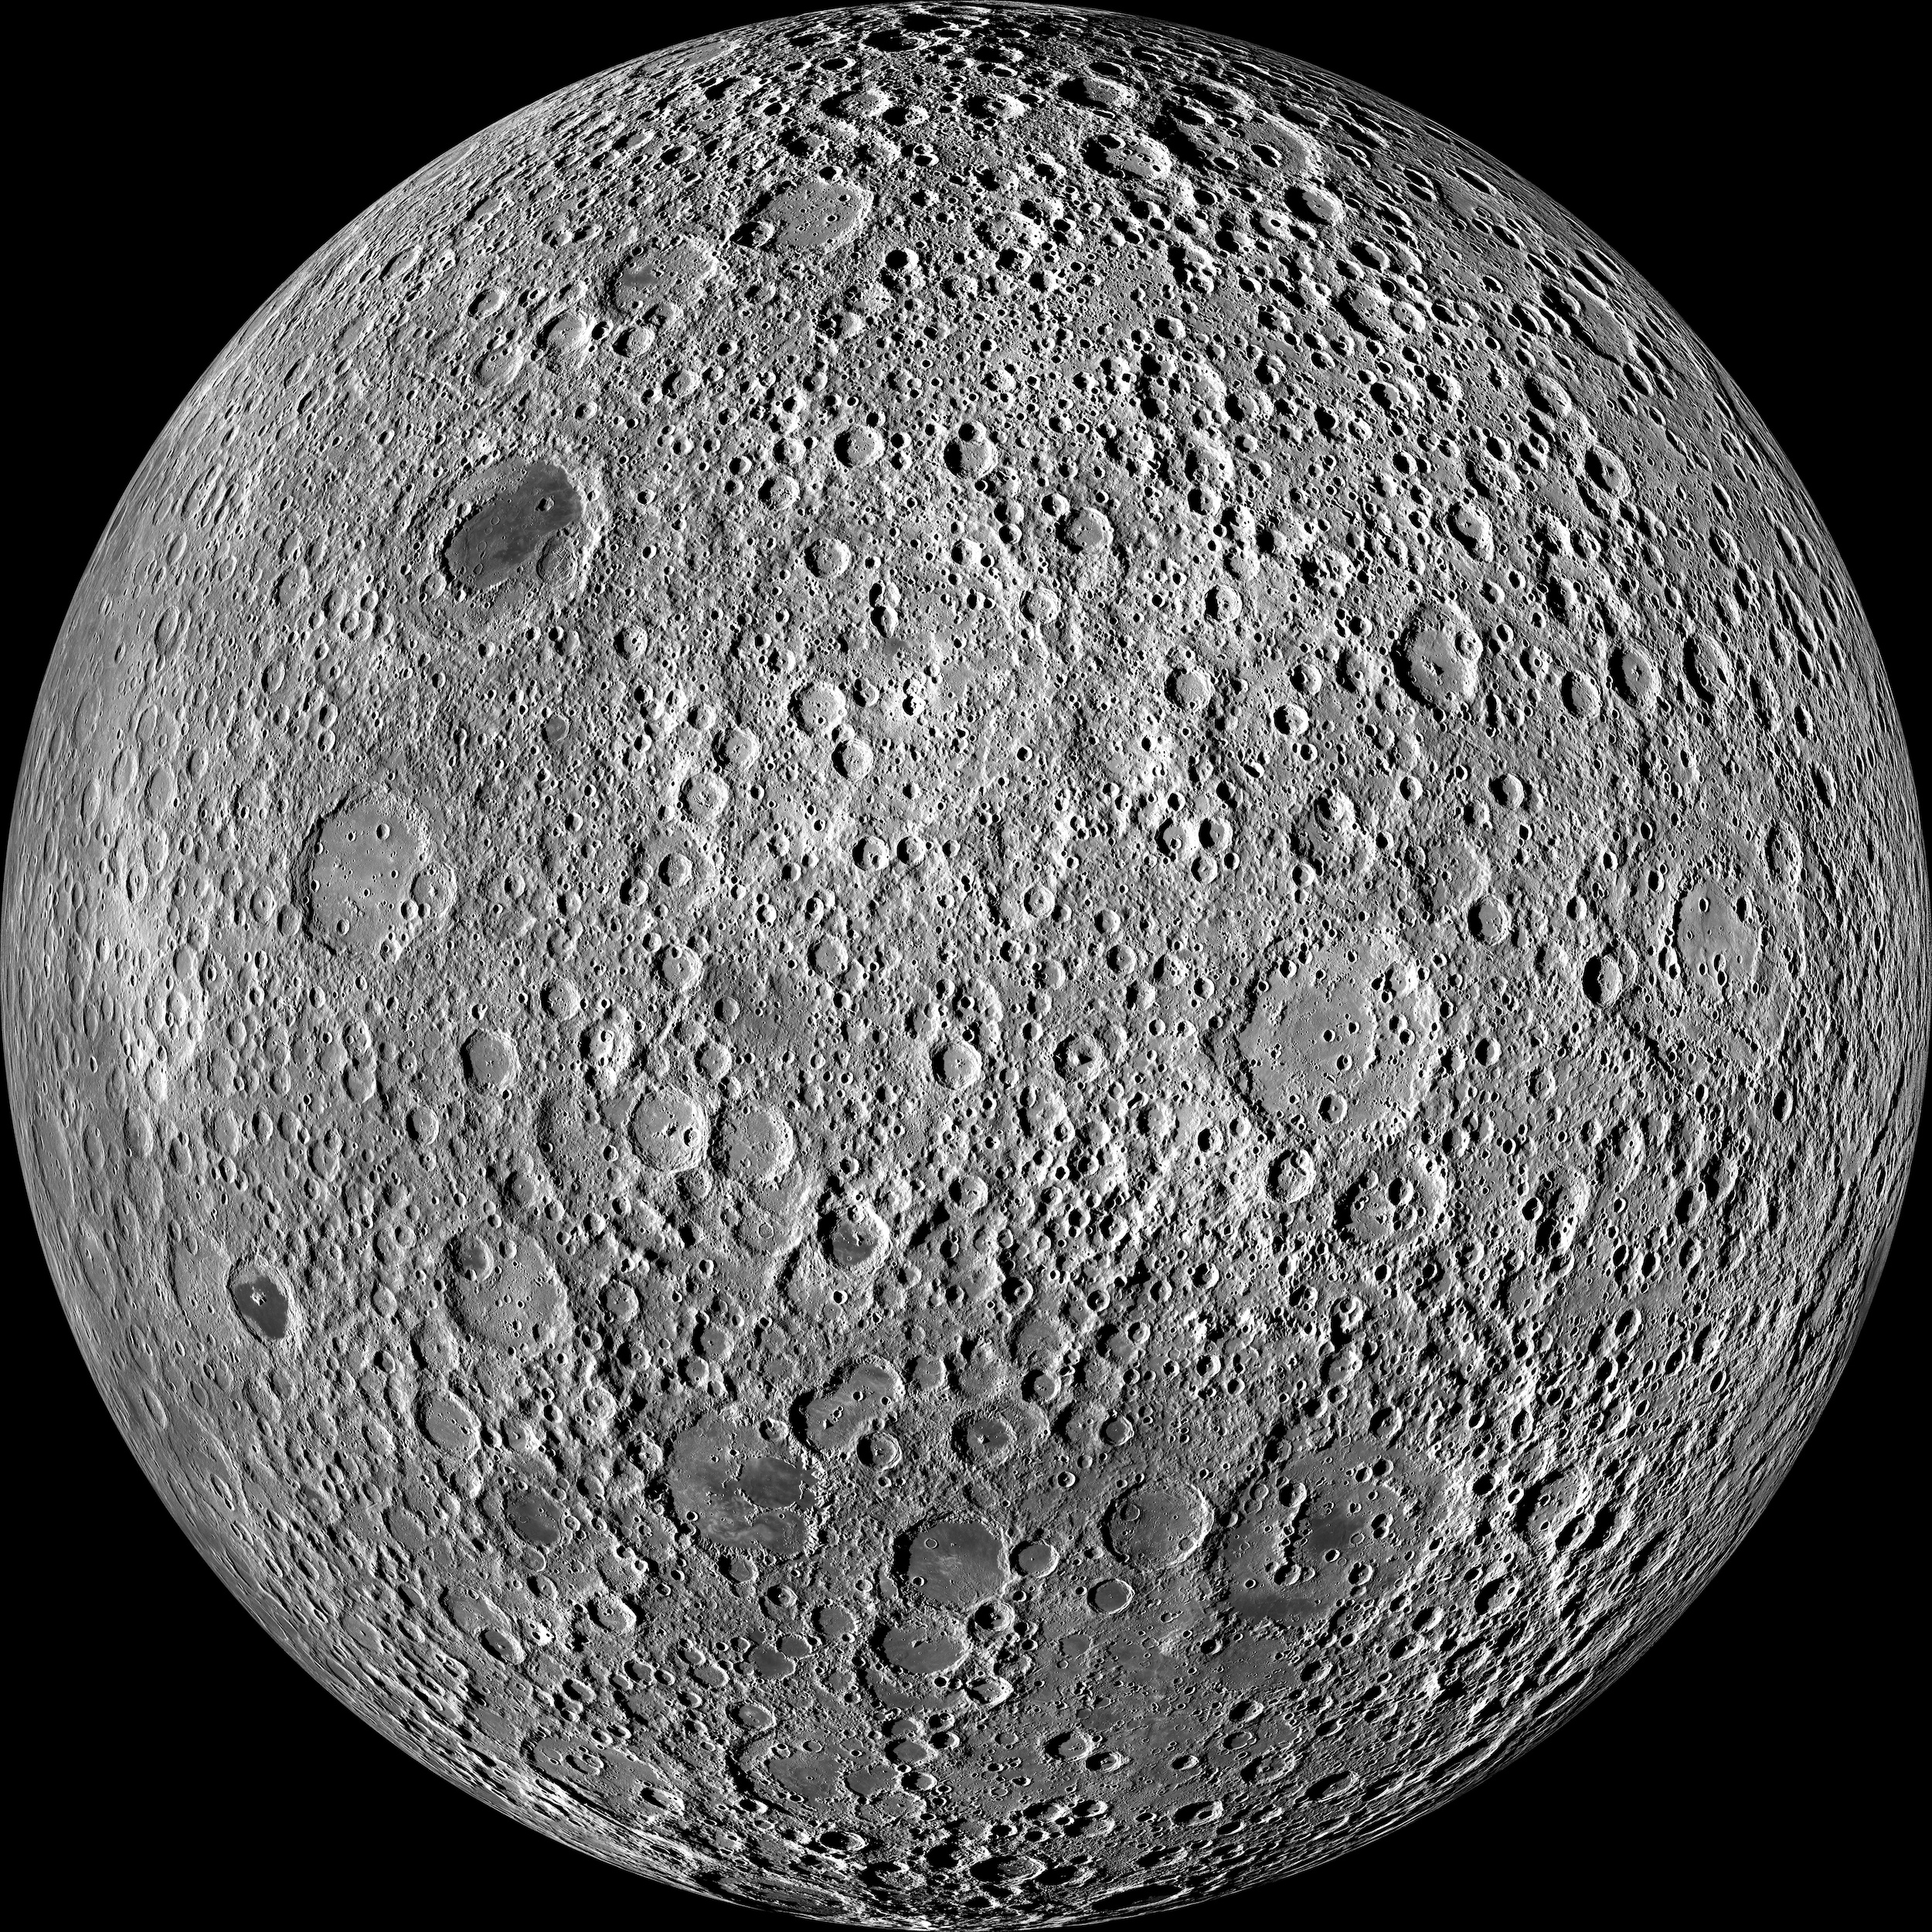 Moon farside